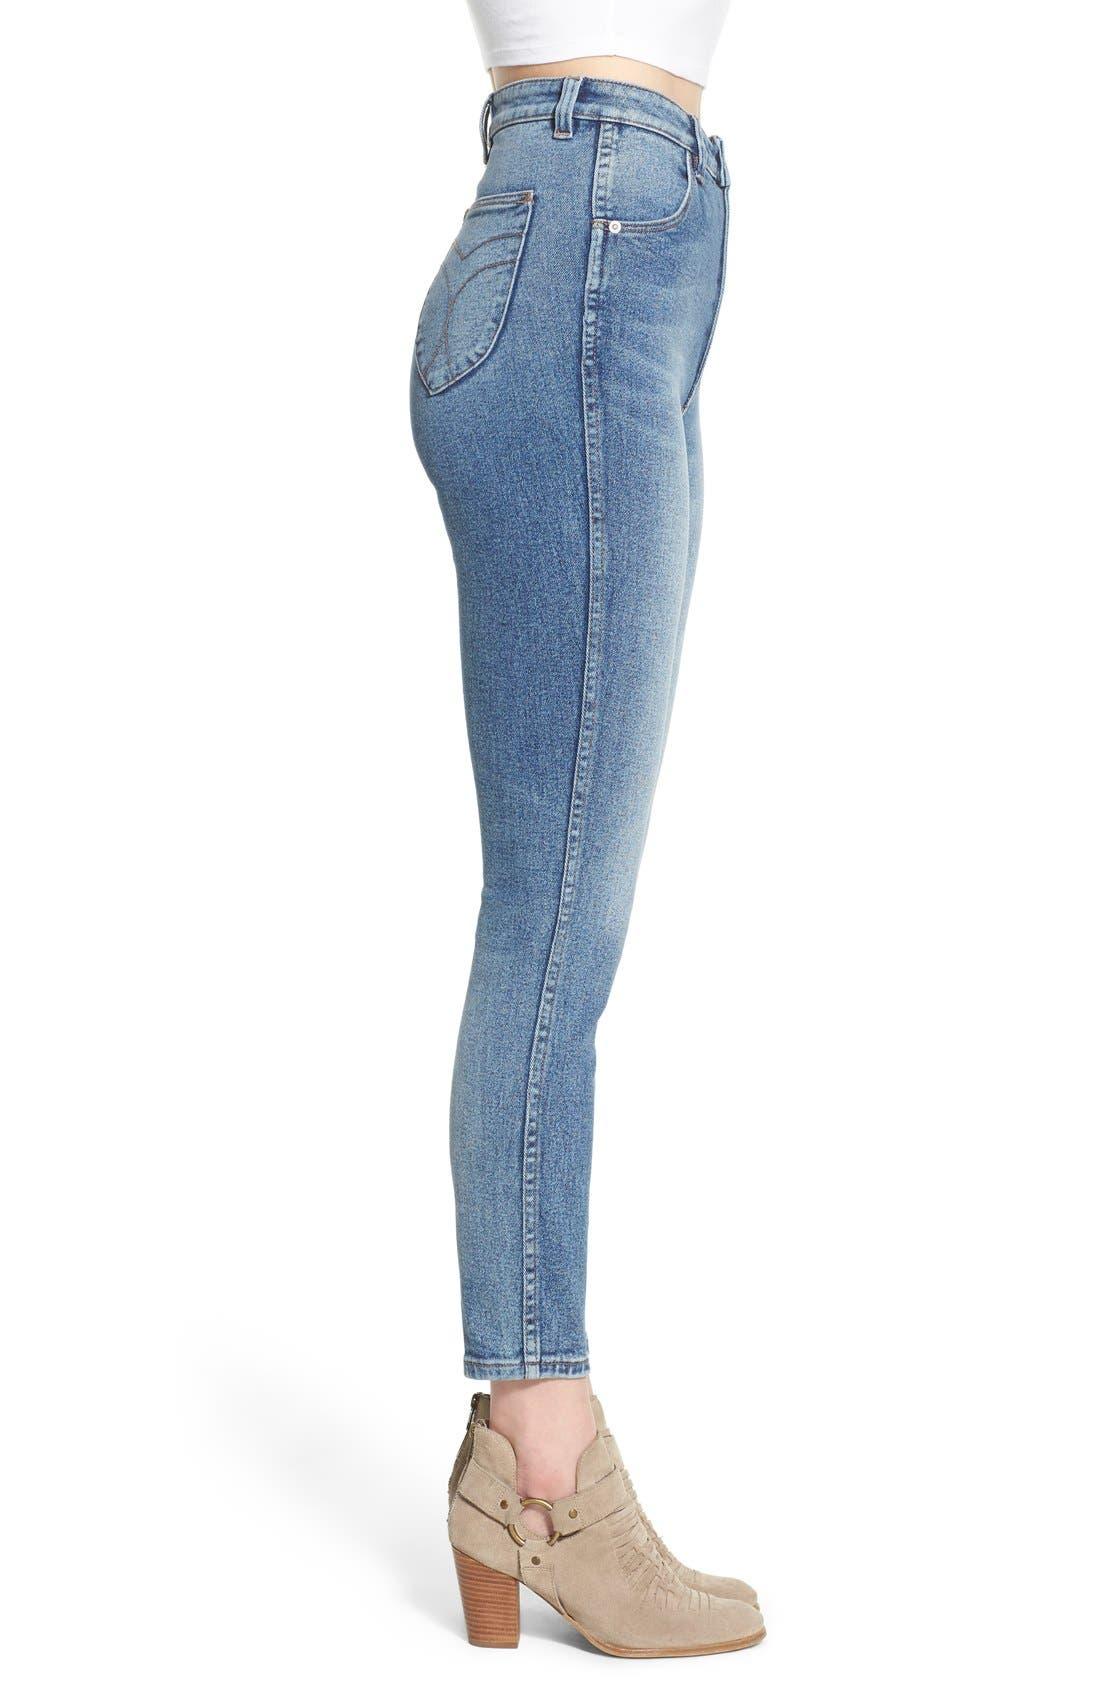 Alternate Image 3  - Rolla's 'East Coast' High Rise Ankle Skinny Jeans (Folk Blue)